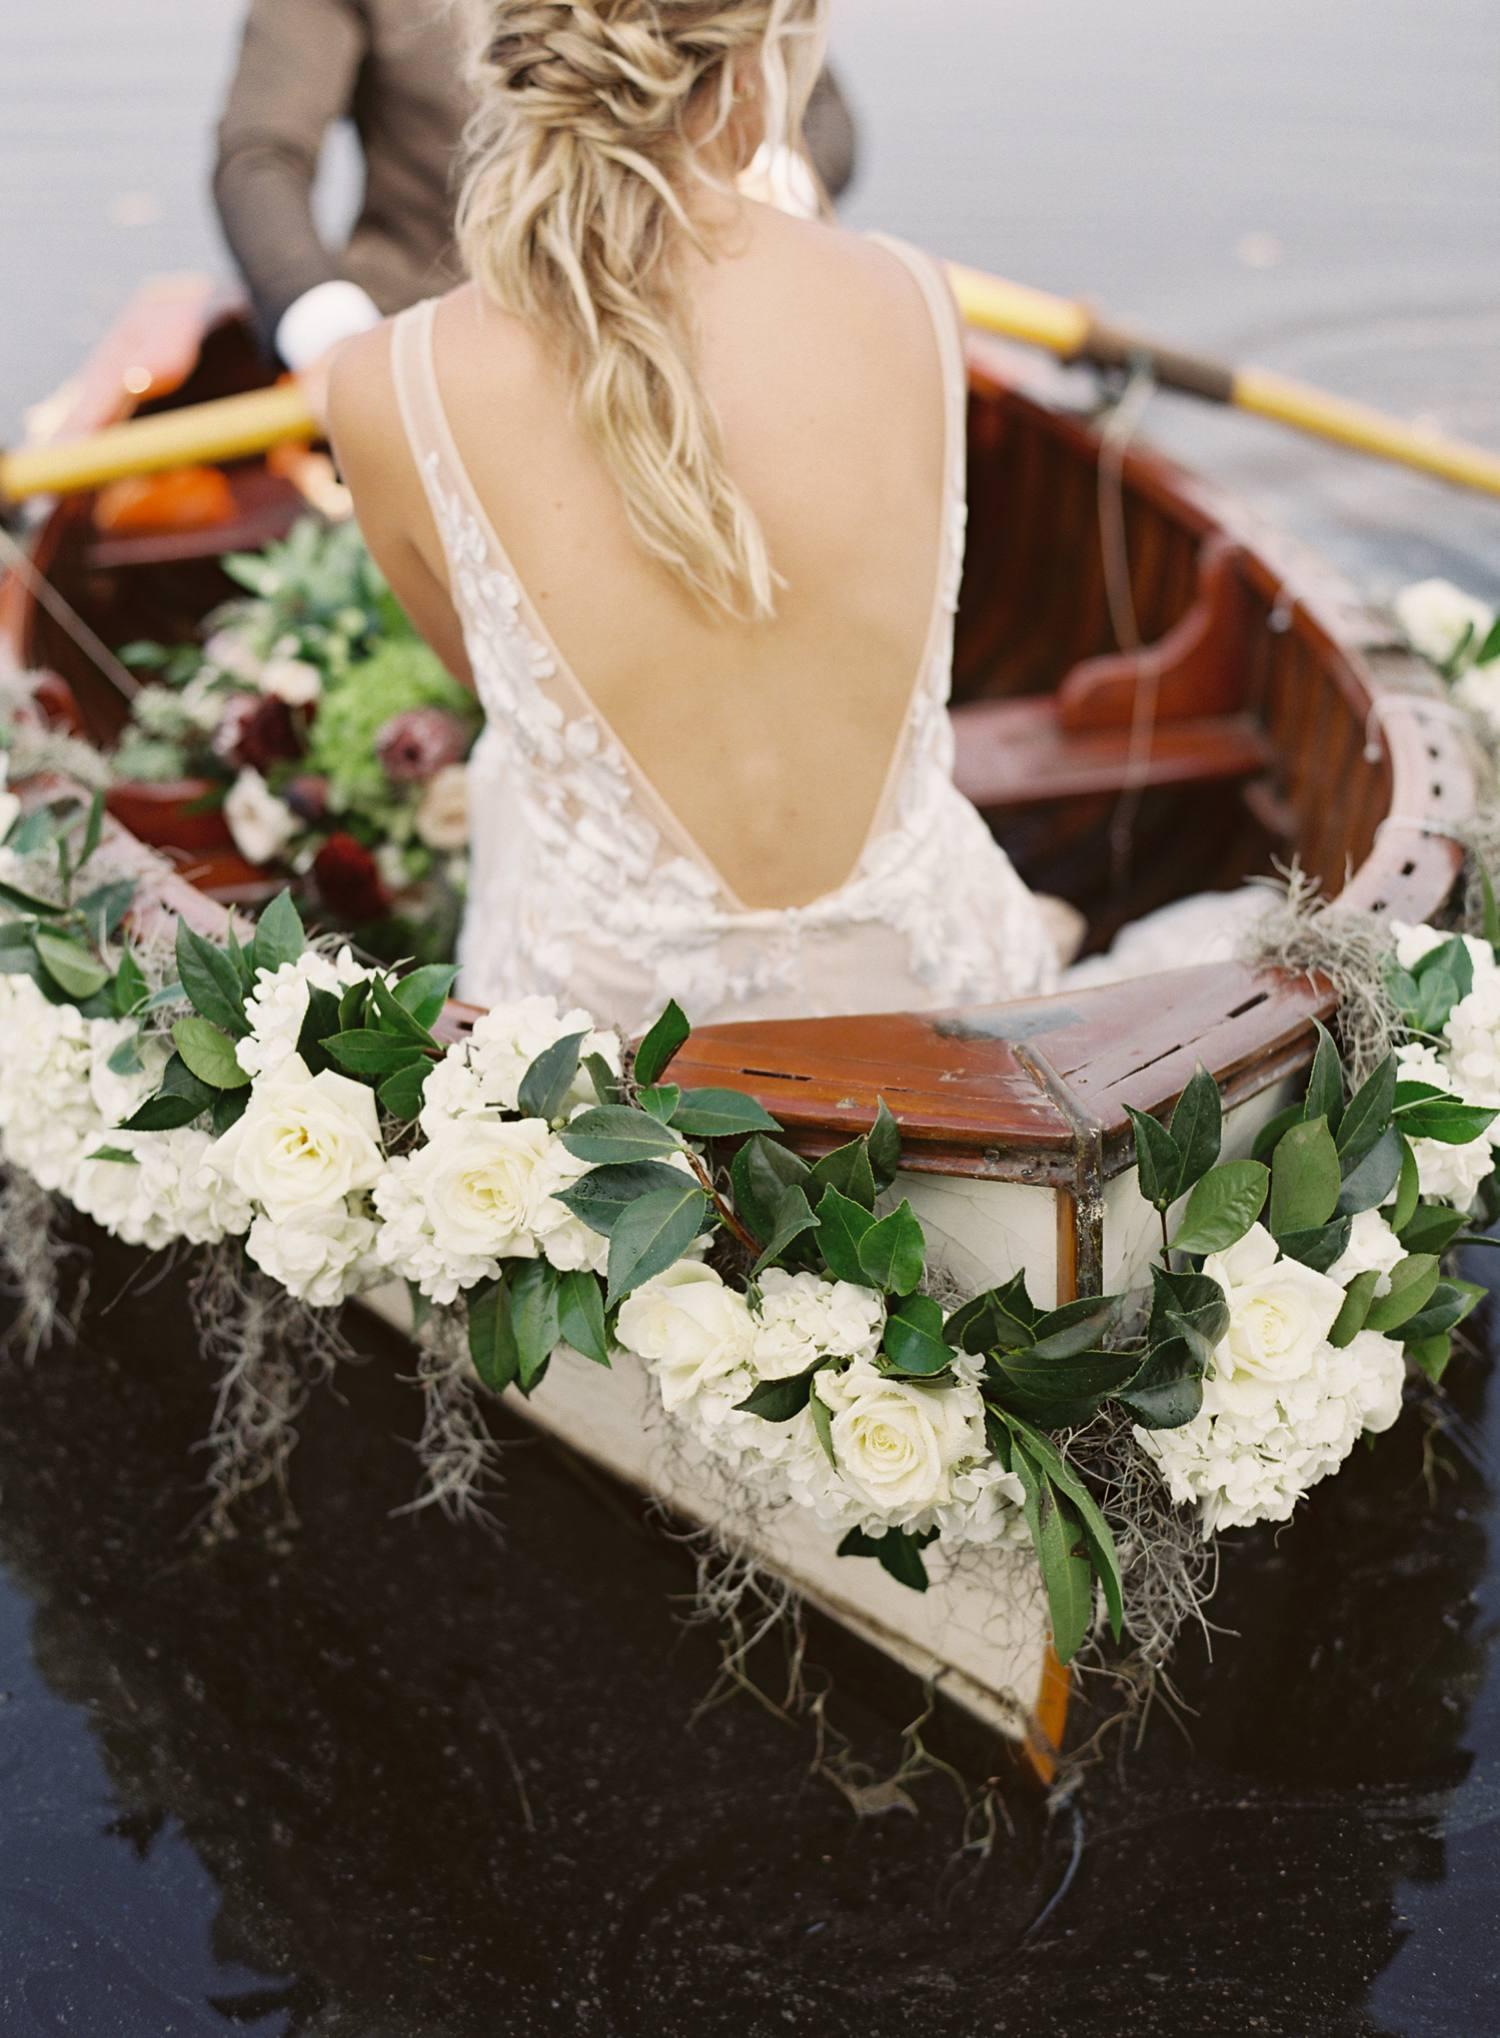 boonehallplantation_wedding_22.jpg